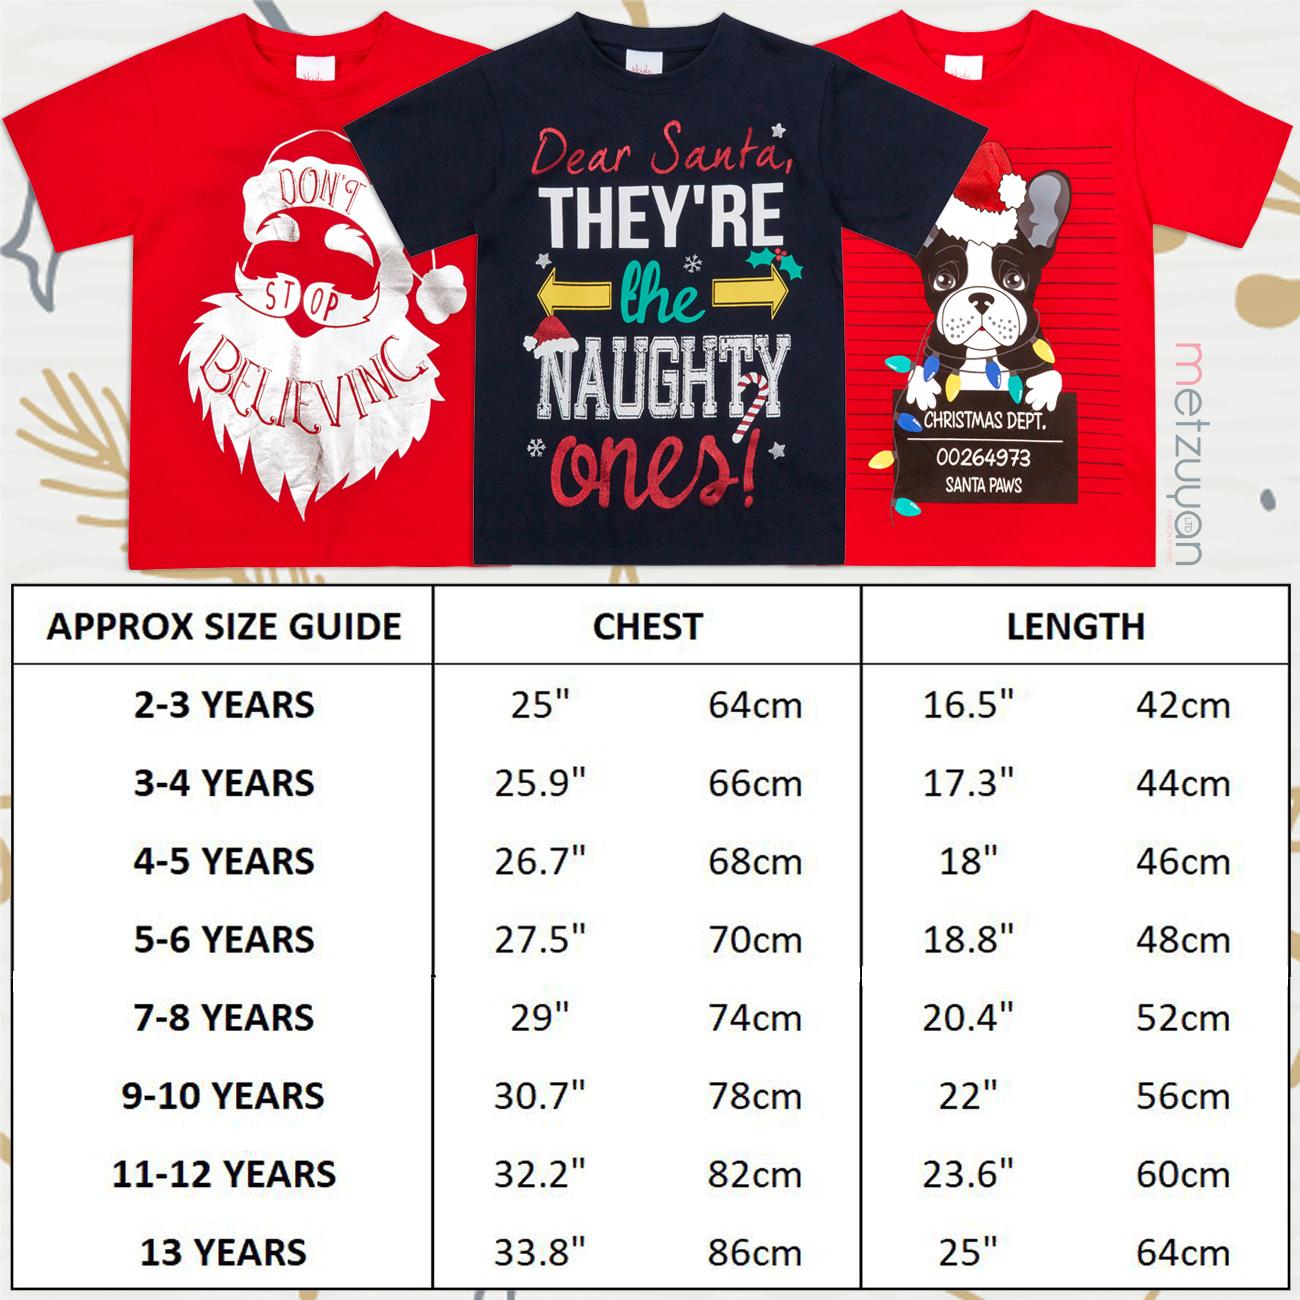 Childrens-Girls-Boys-Xmas-T-Shirts-Printed-Christmas-Design-100-Cotton-2-13-Yrs thumbnail 38